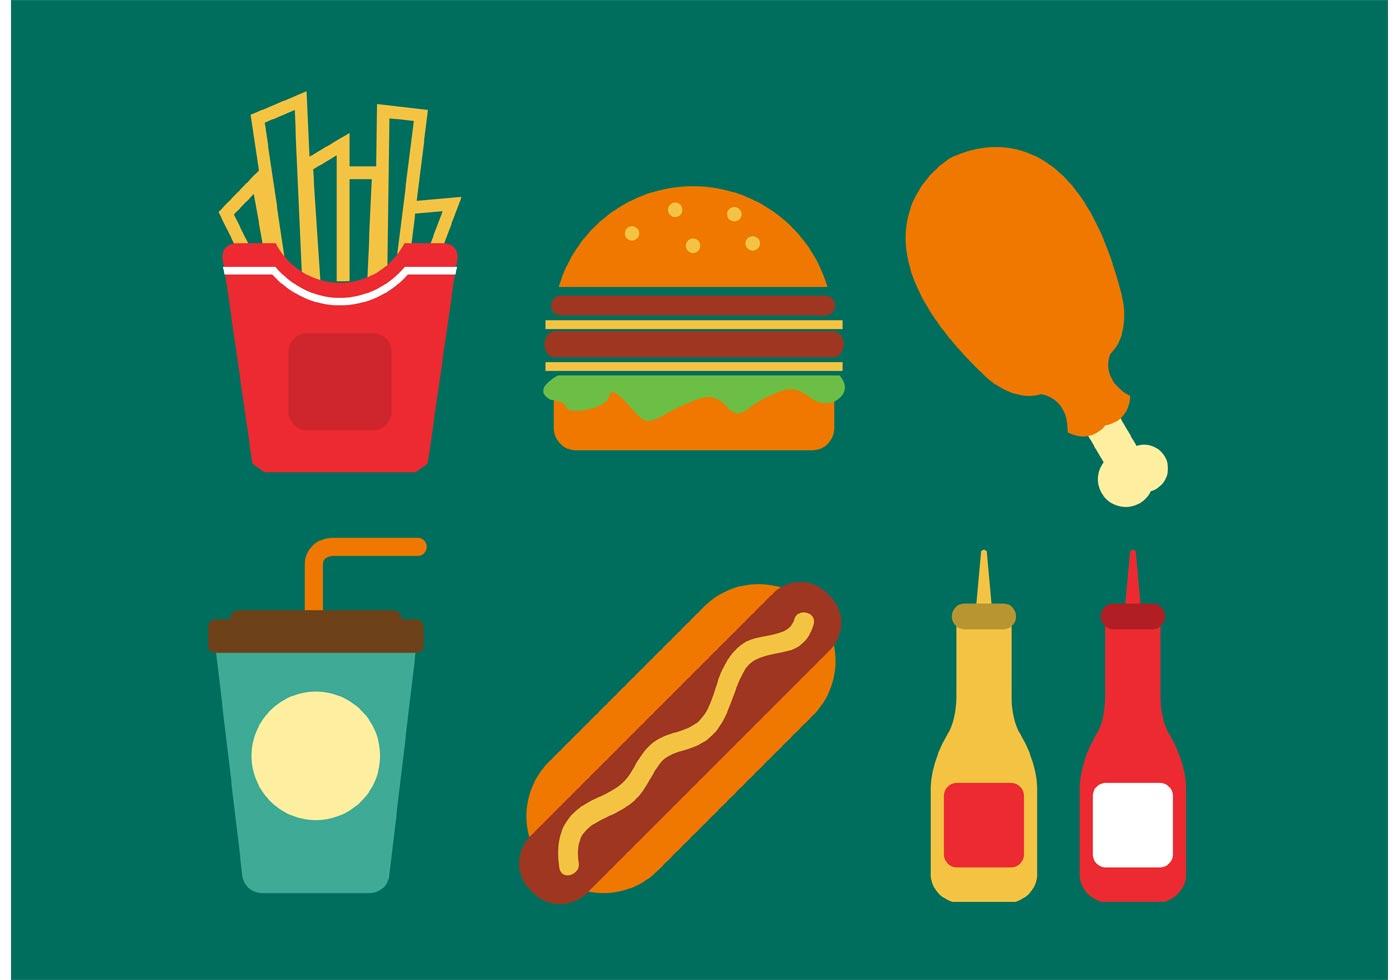 Fast Food Vectors - Download Free Vector Art, Stock ...